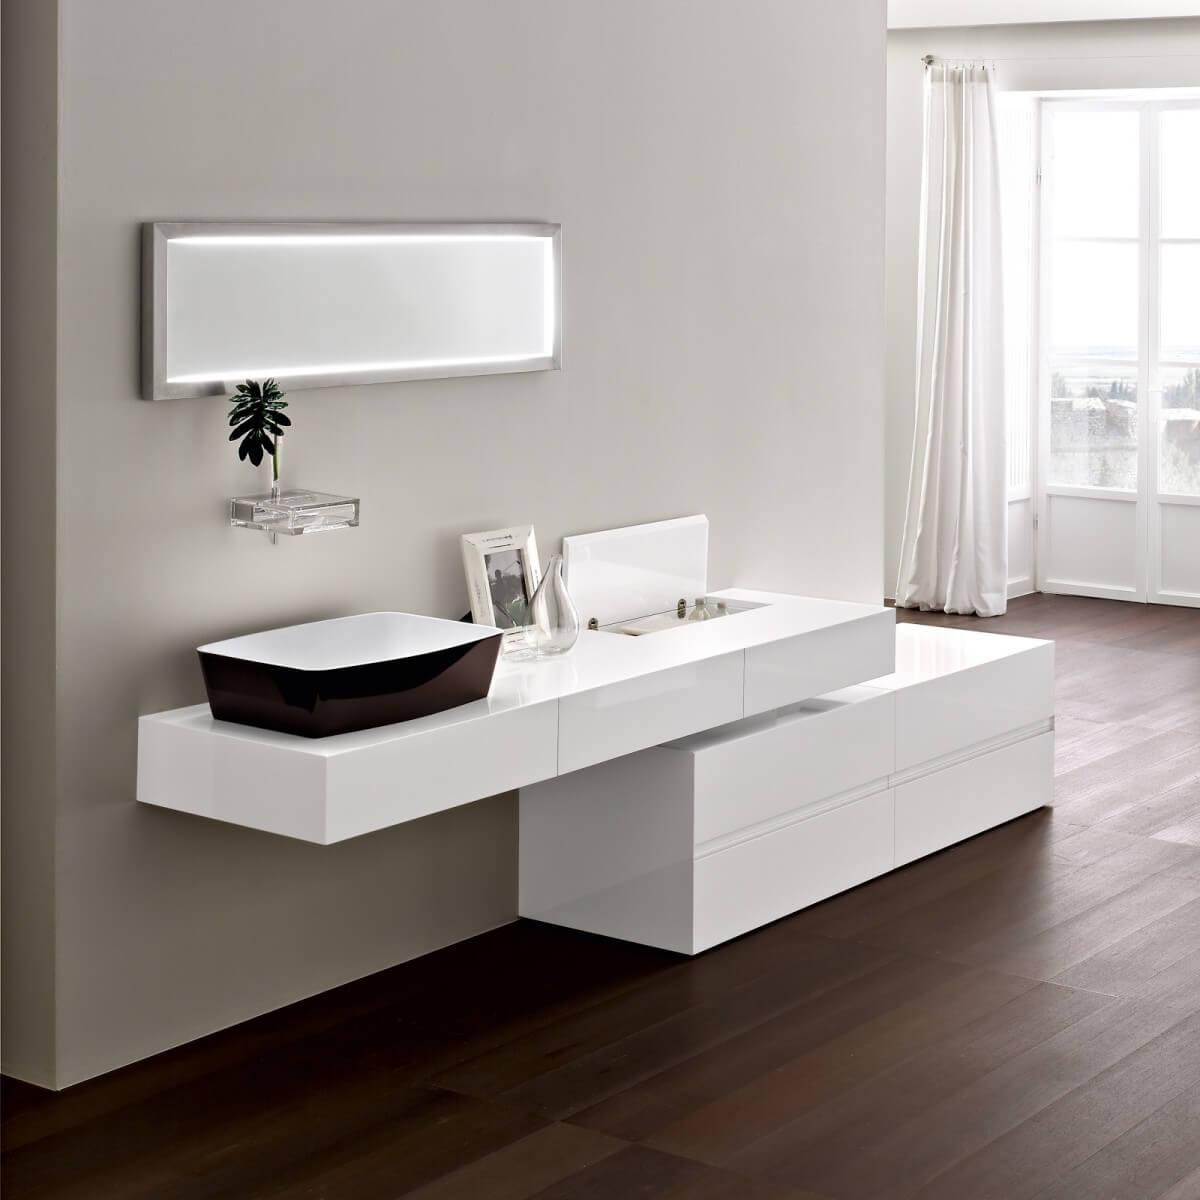 Ultra Modern Bathroom Designs Update The Decor Of Your Bathroom - Ultra modern bathroom sinks